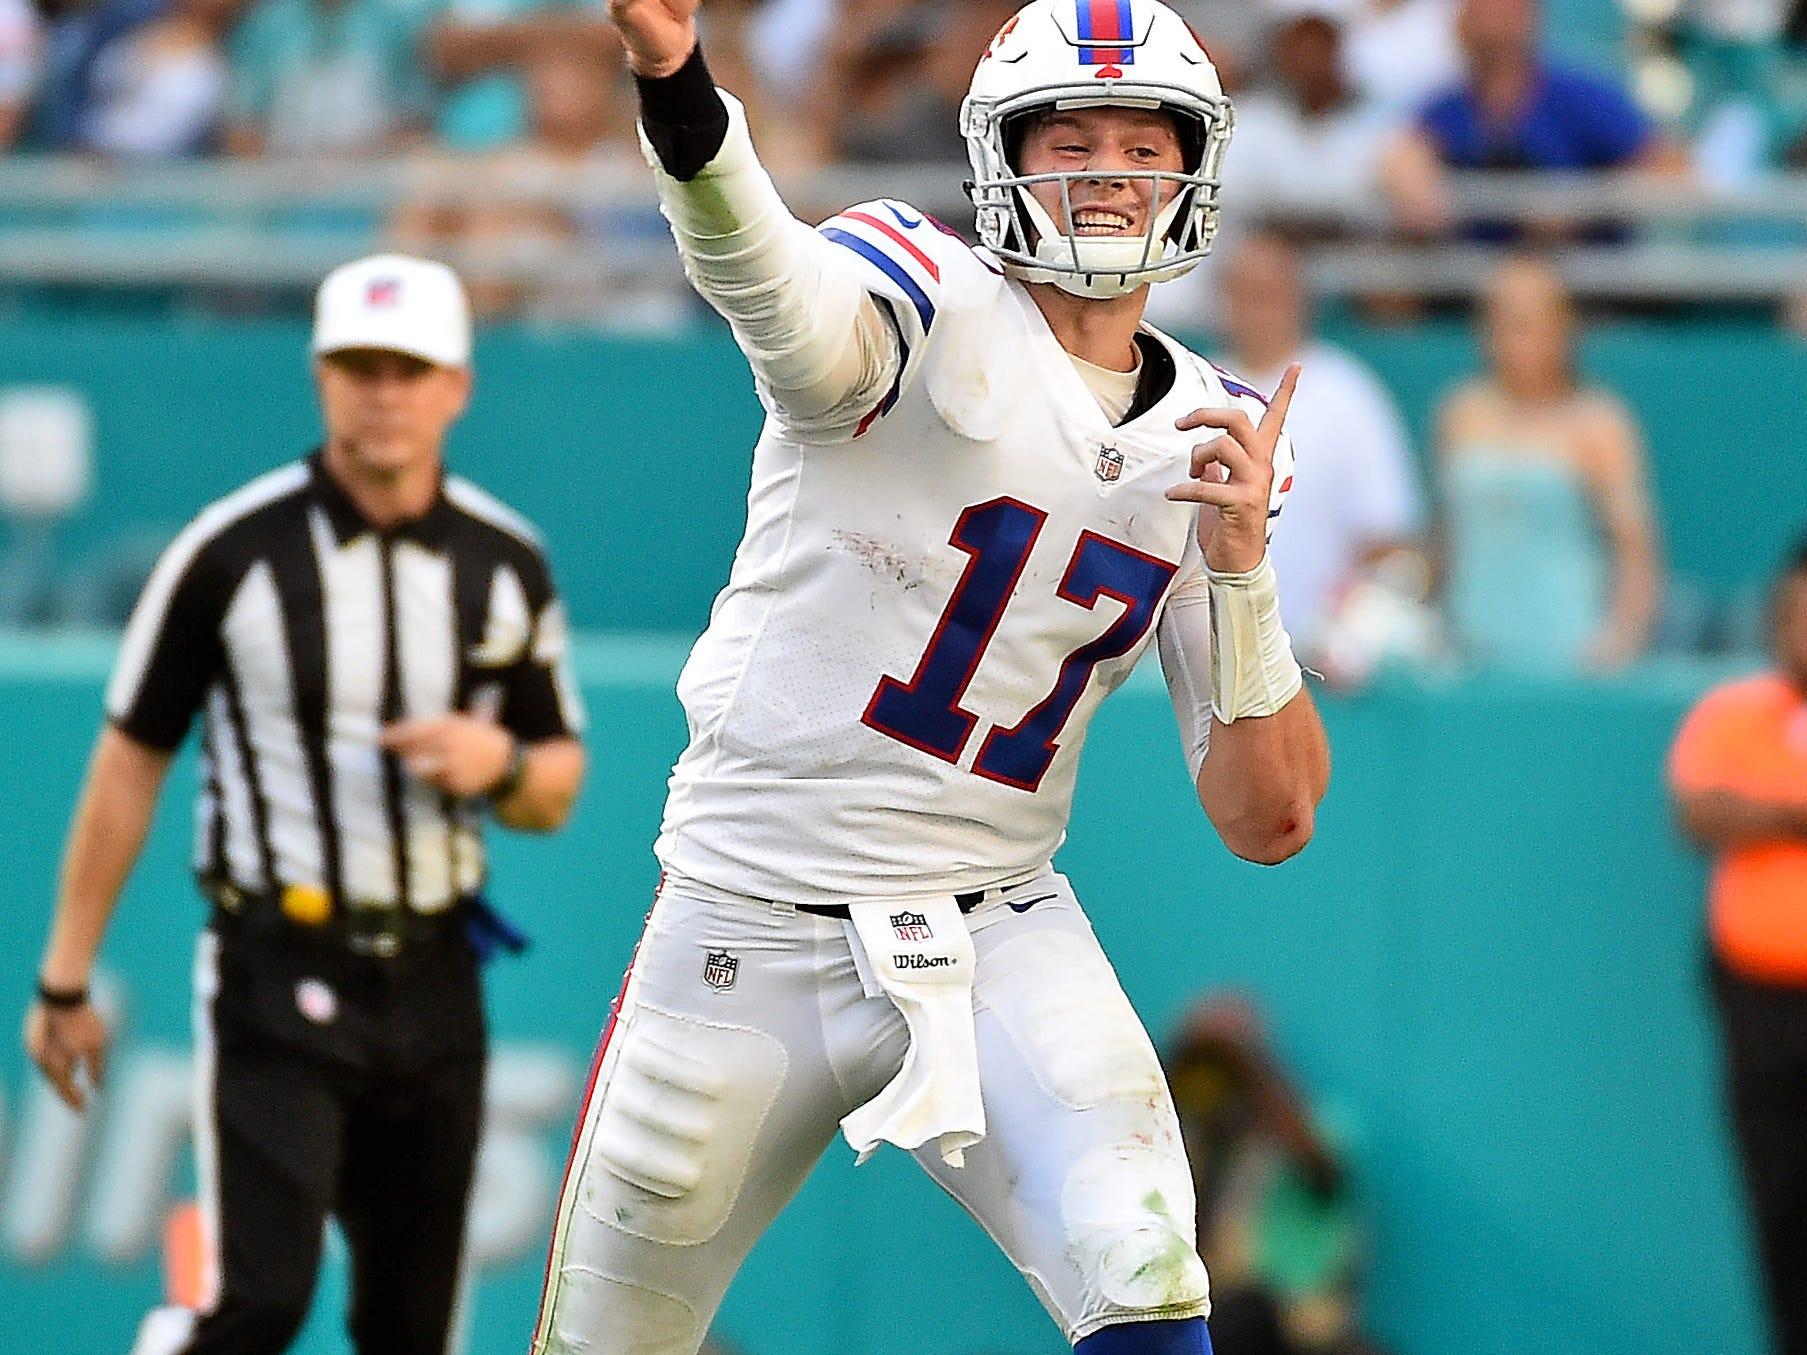 Dec 2, 2018; Miami Gardens, FL, USA; Buffalo Bills quarterback Josh Allen (17) attempts a pass against the Miami Dolphins during the second half at Hard Rock Stadium. Mandatory Credit: Jasen Vinlove-USA TODAY Sports